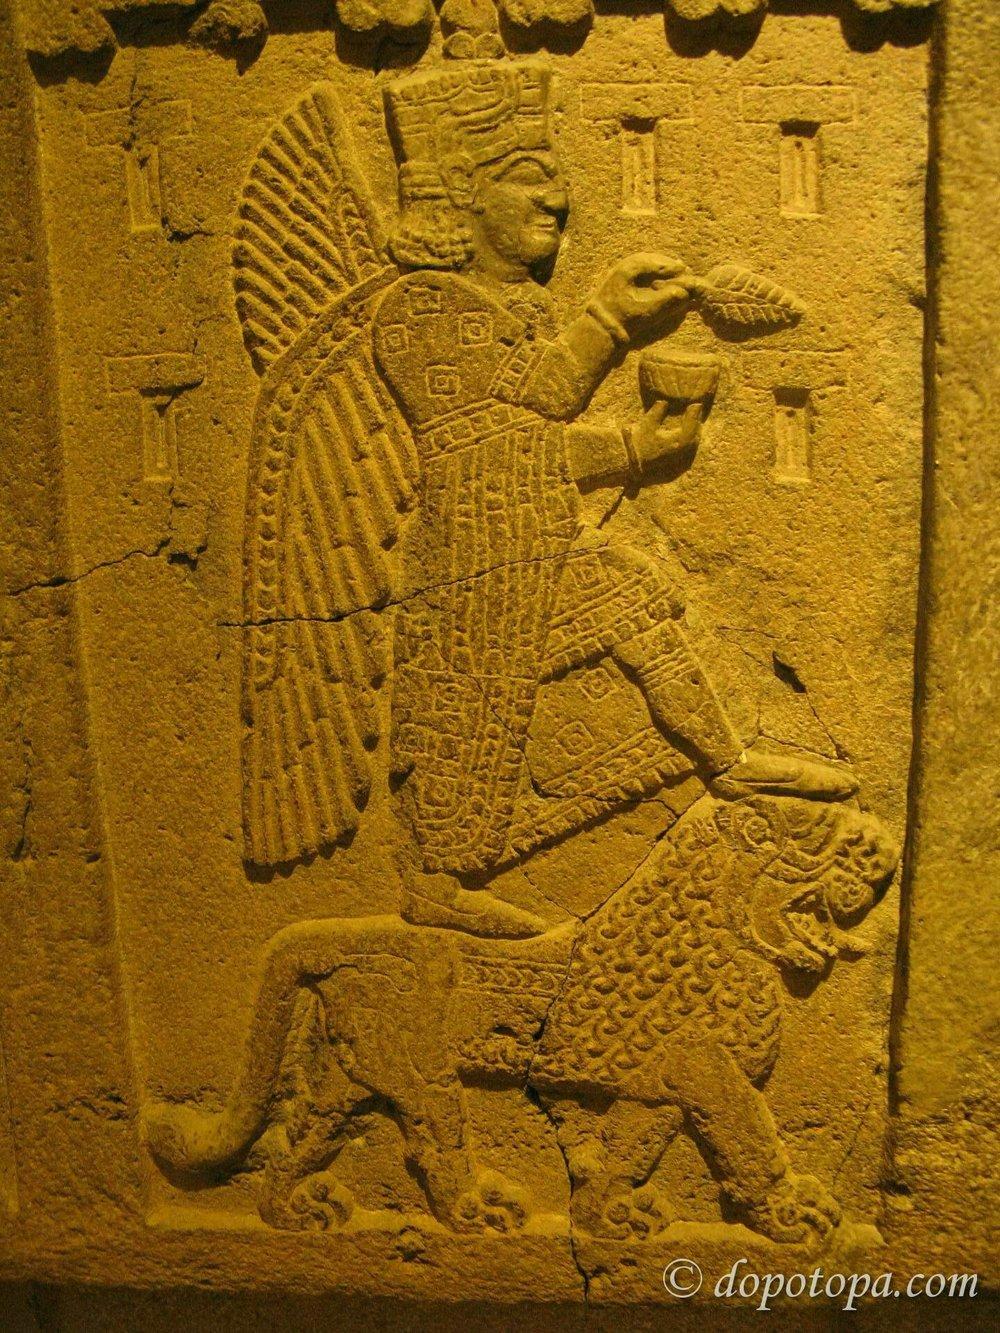 ankara_museum_stone_artefacts_57_1.JPG